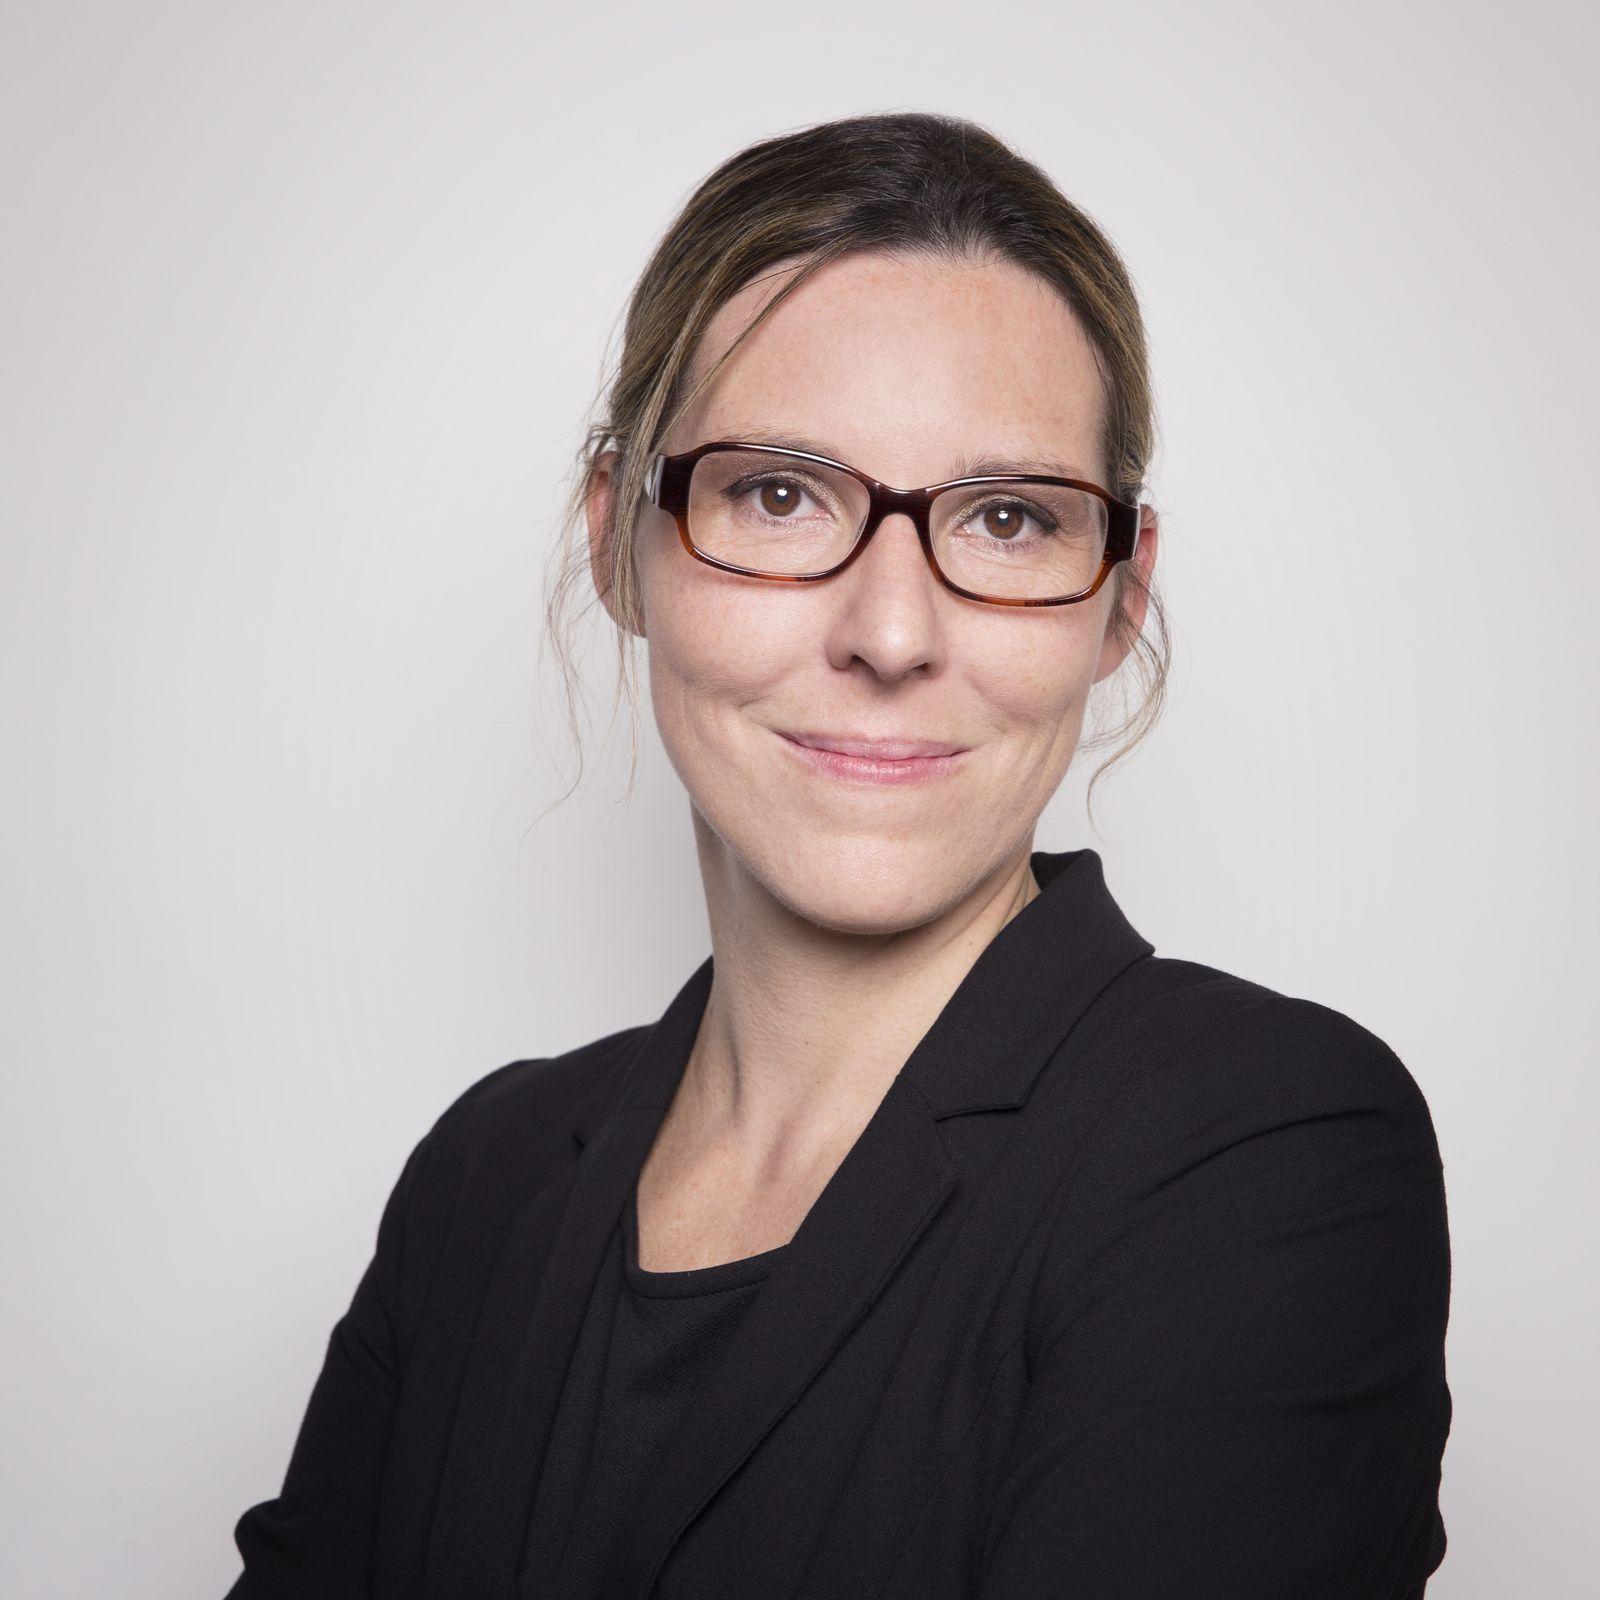 Simone Brinkmann